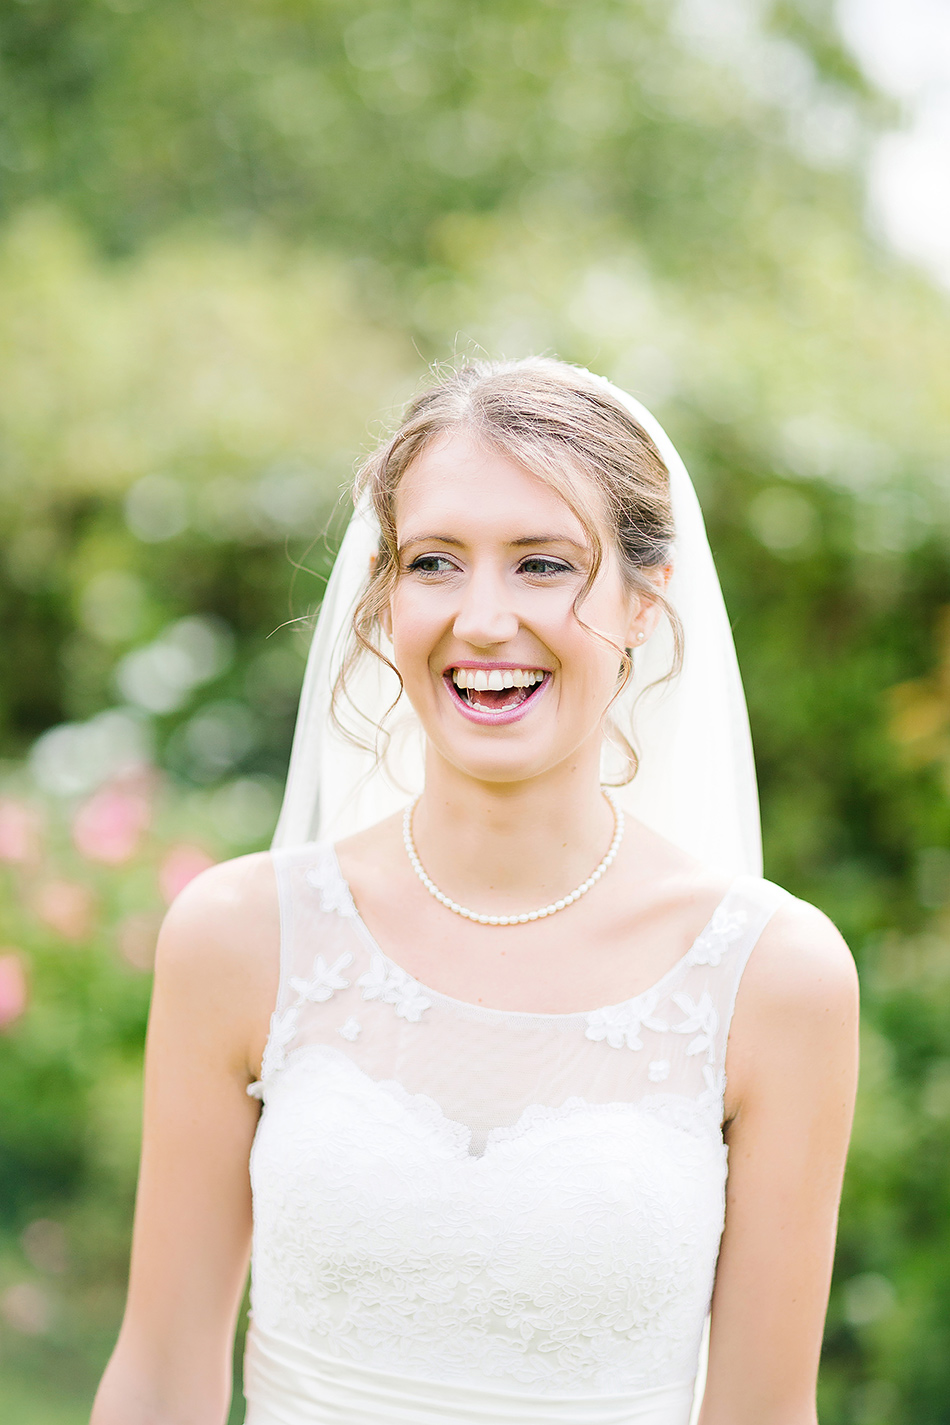 bride with bridesmaids wedding photography